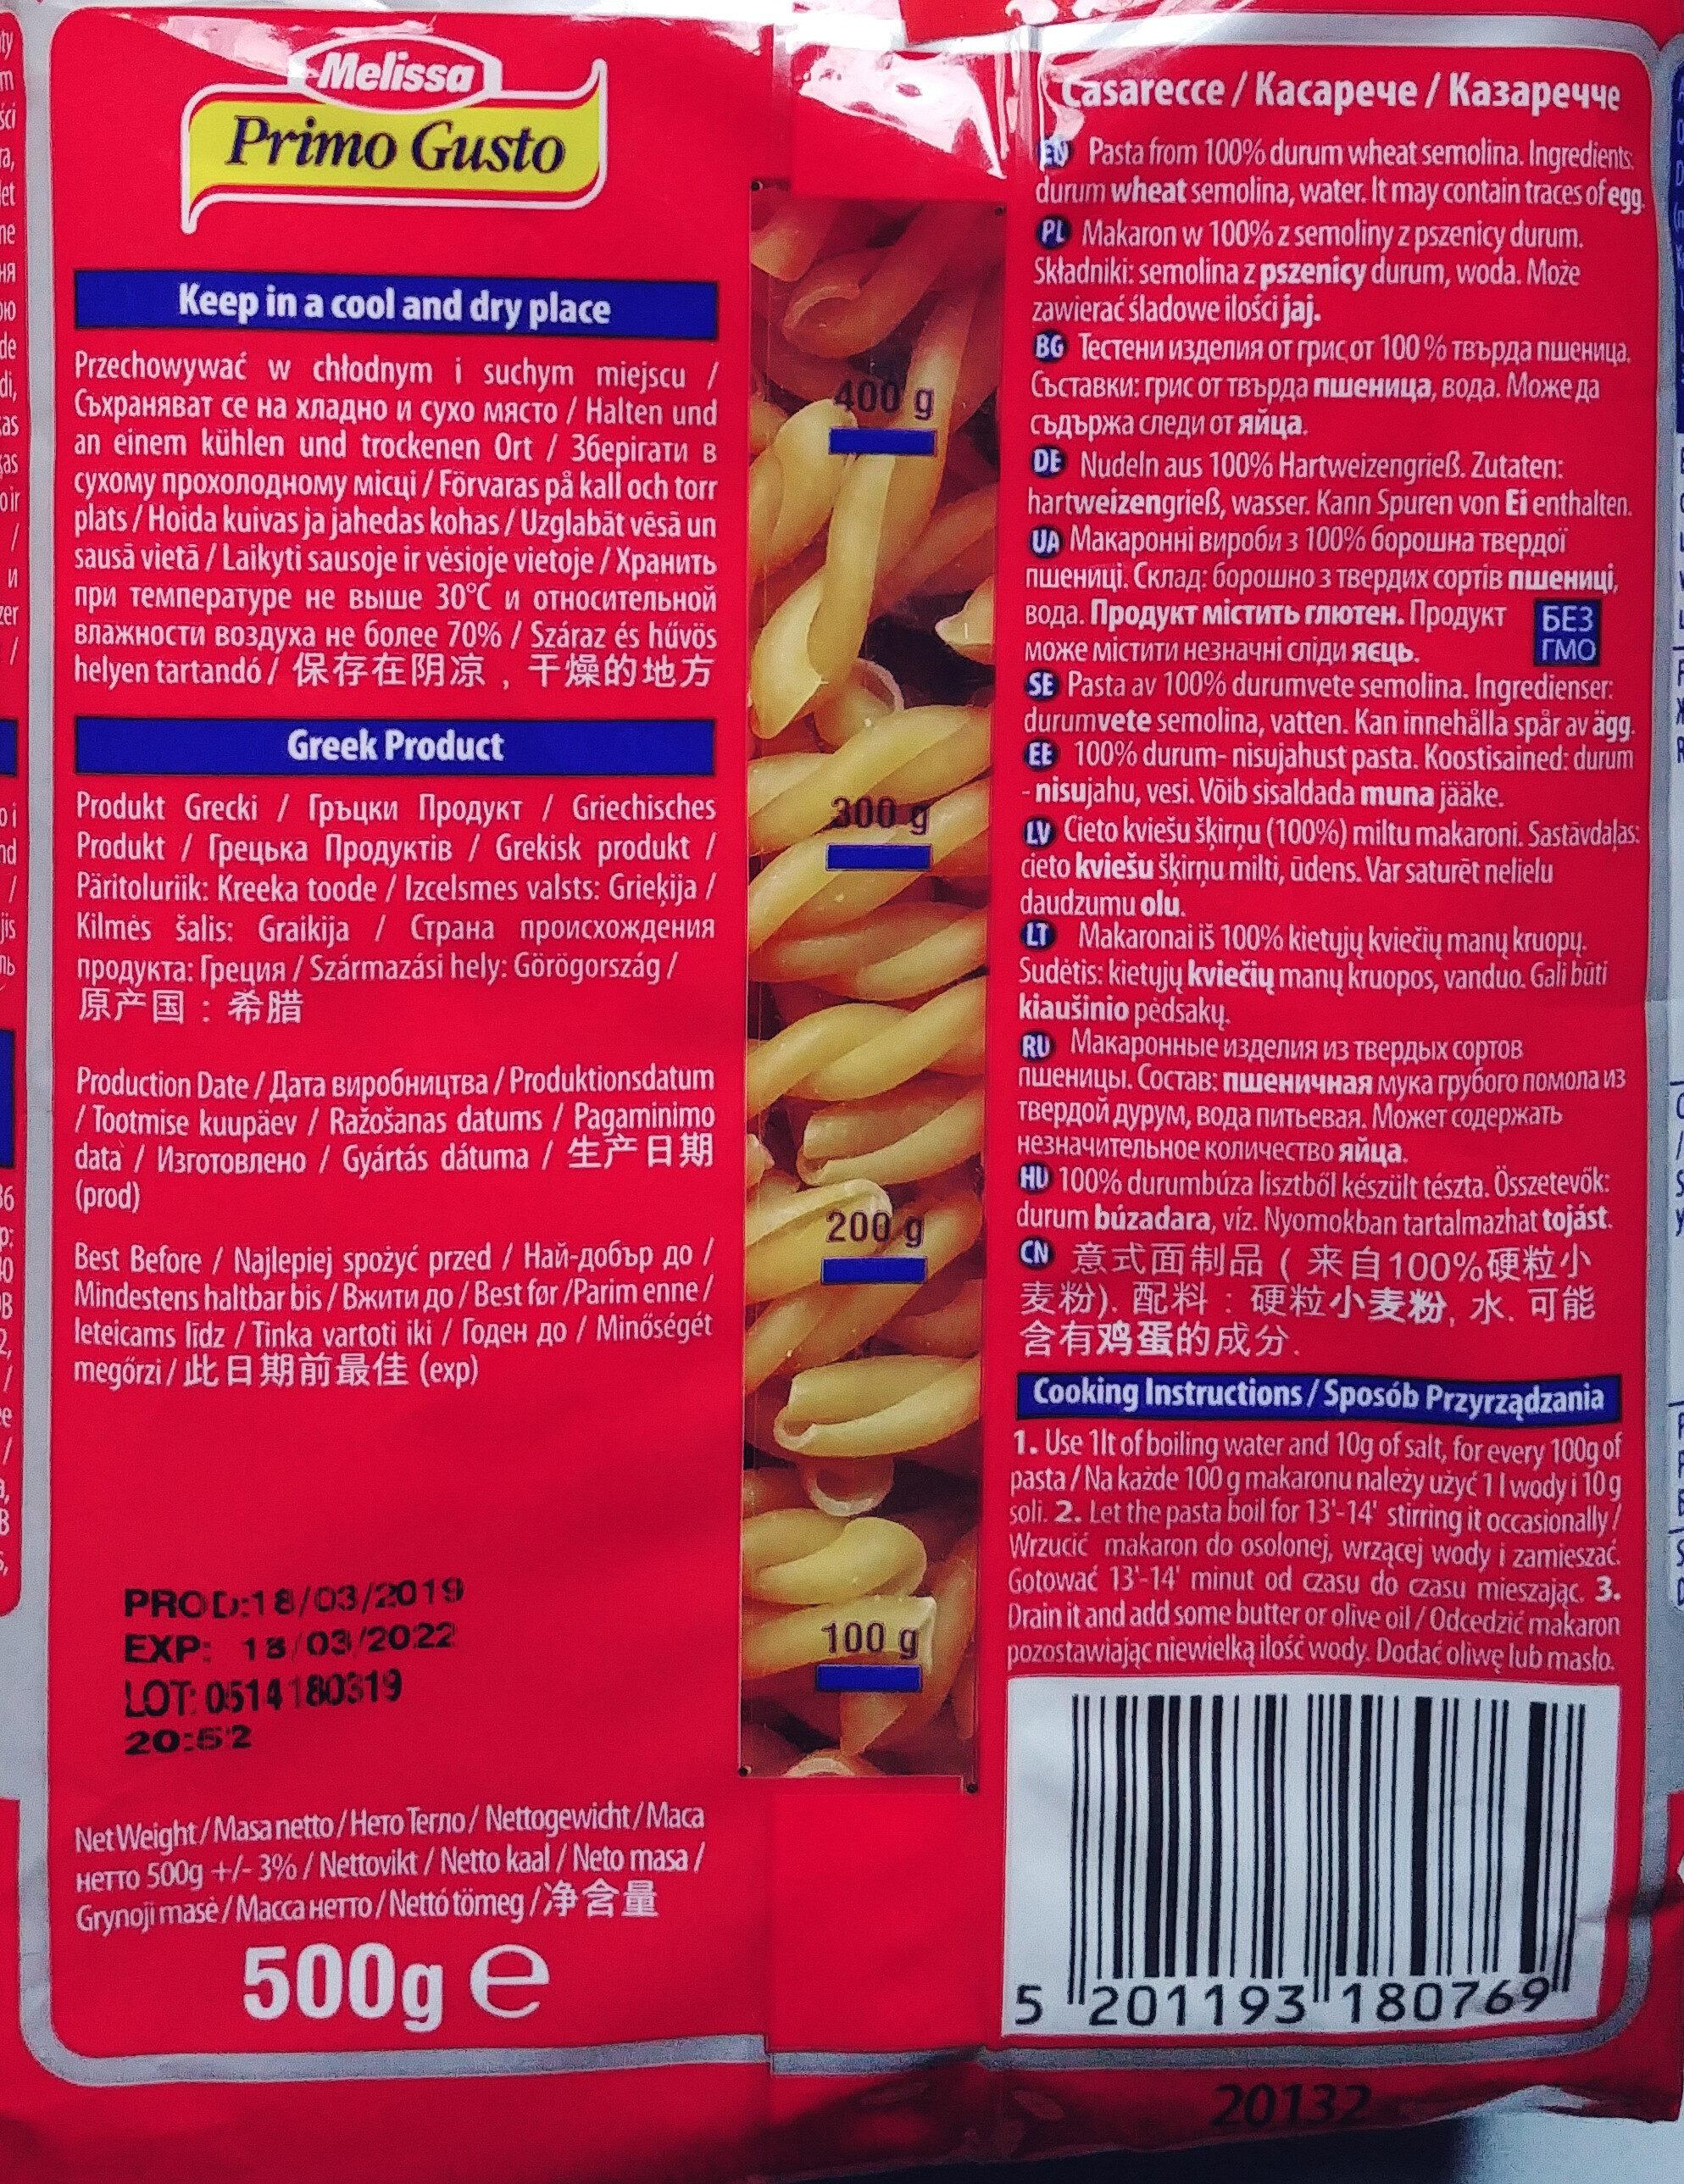 Makaron z semoliny z pszenicy durum - Ingredients